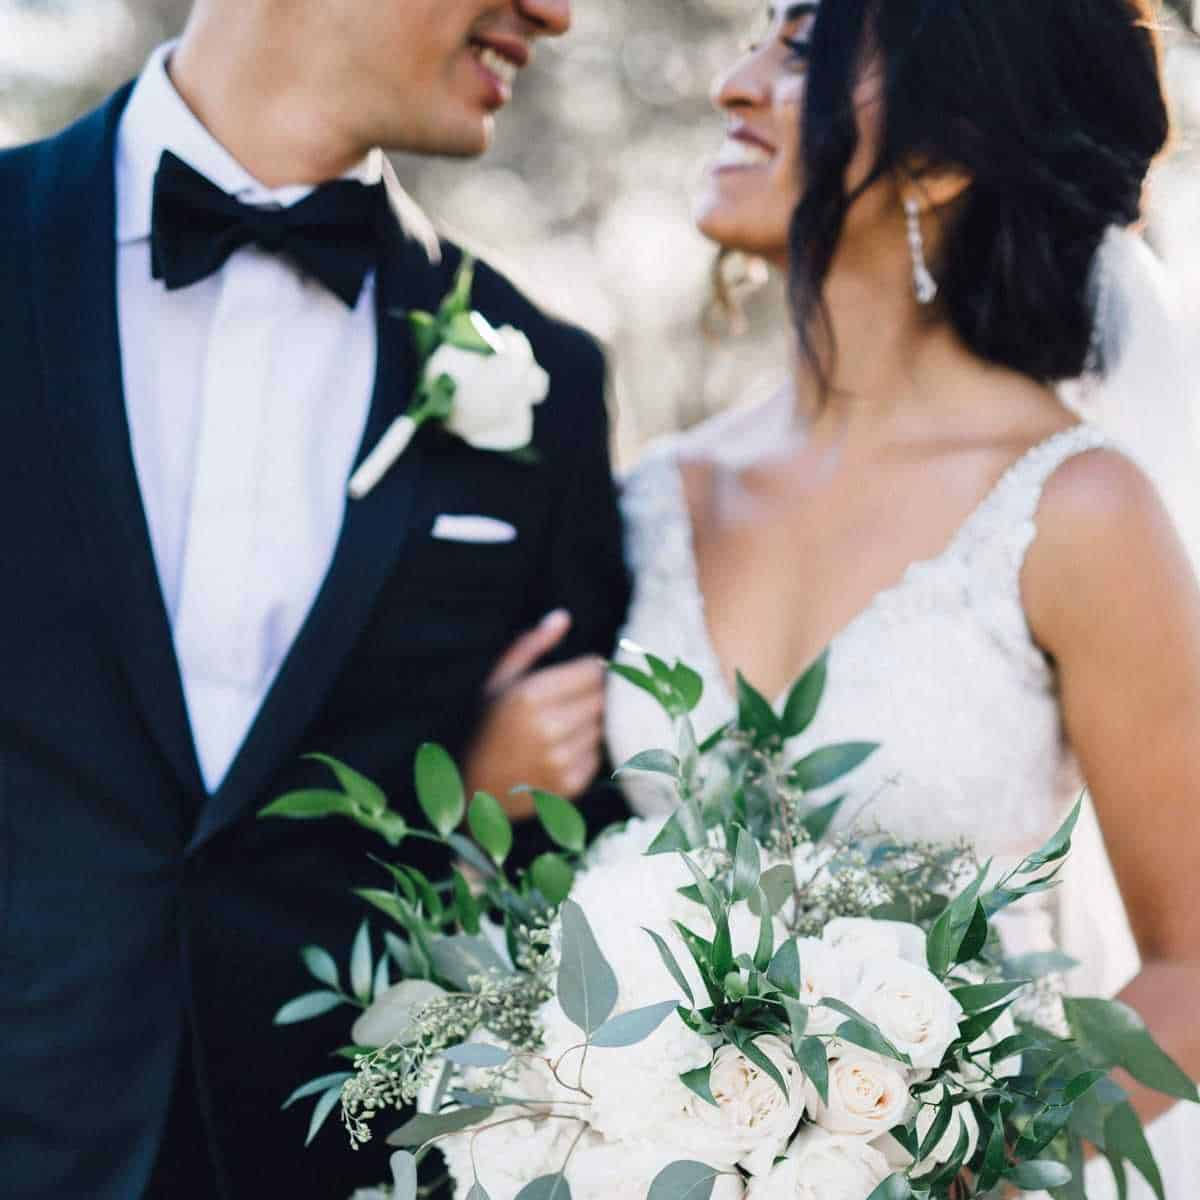 Toronto Wedding Planner - Full Planning